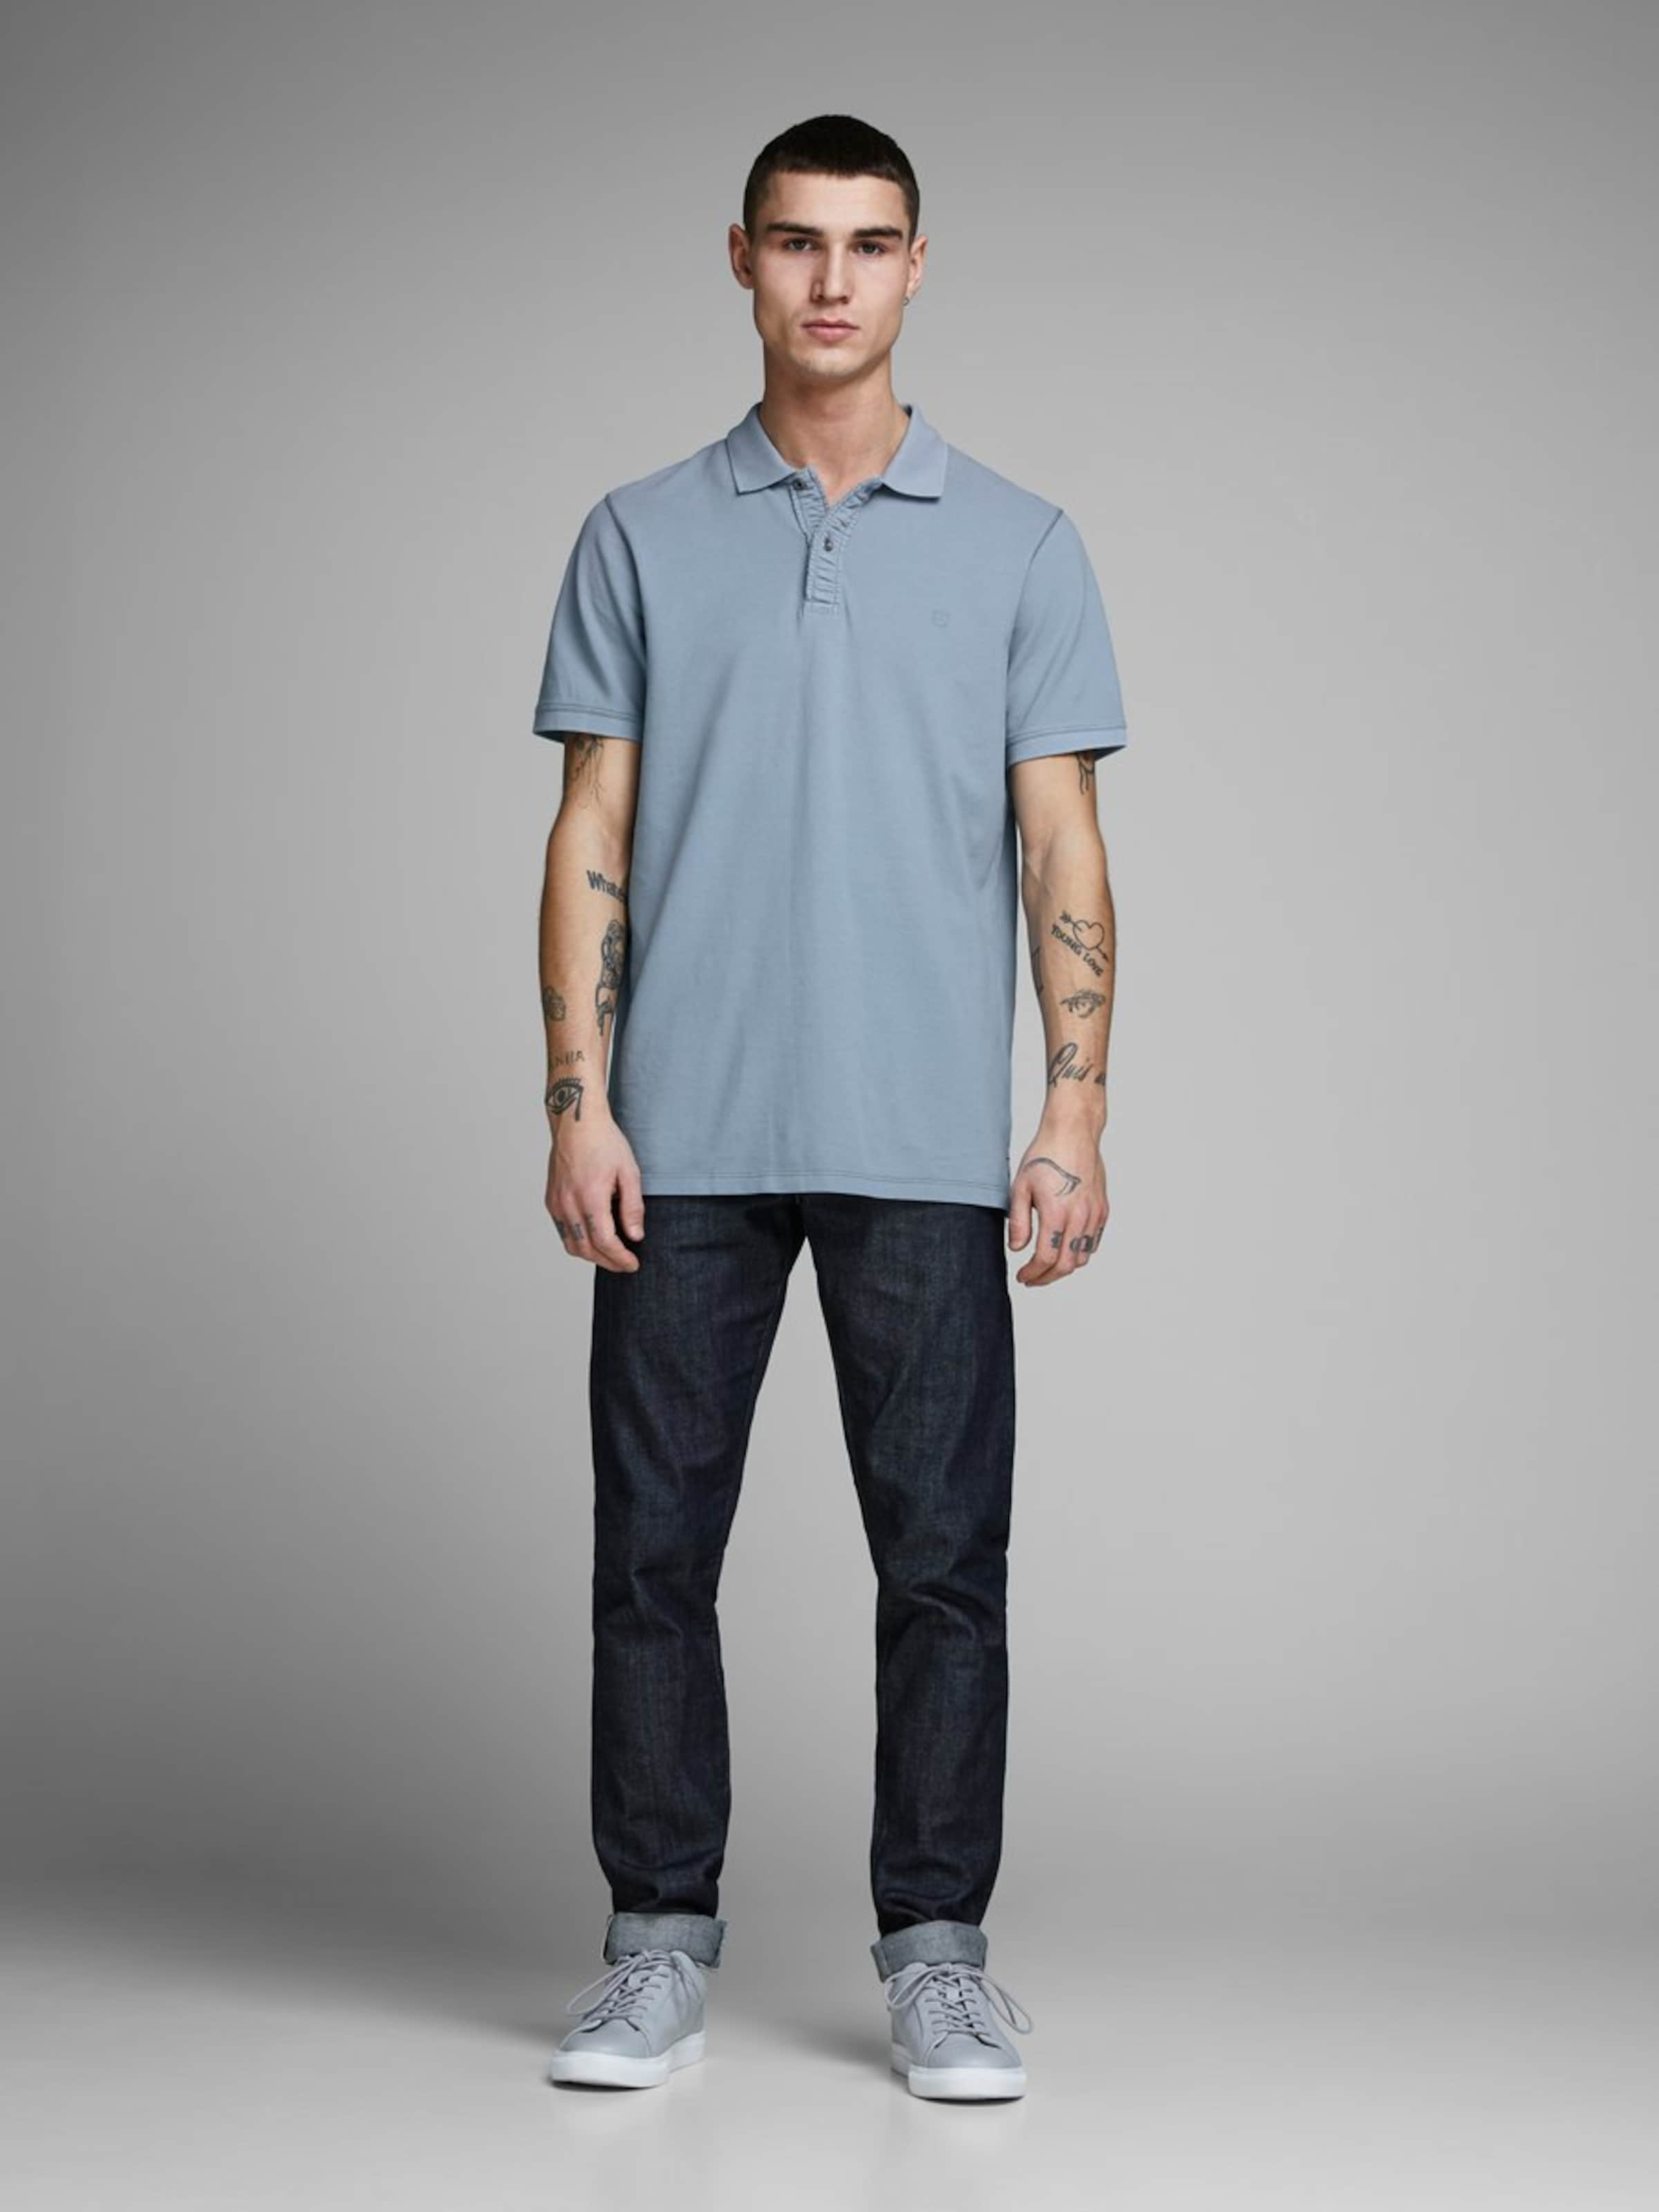 Jones T Bleu Fumé Jackamp; En shirt EH92YDWI